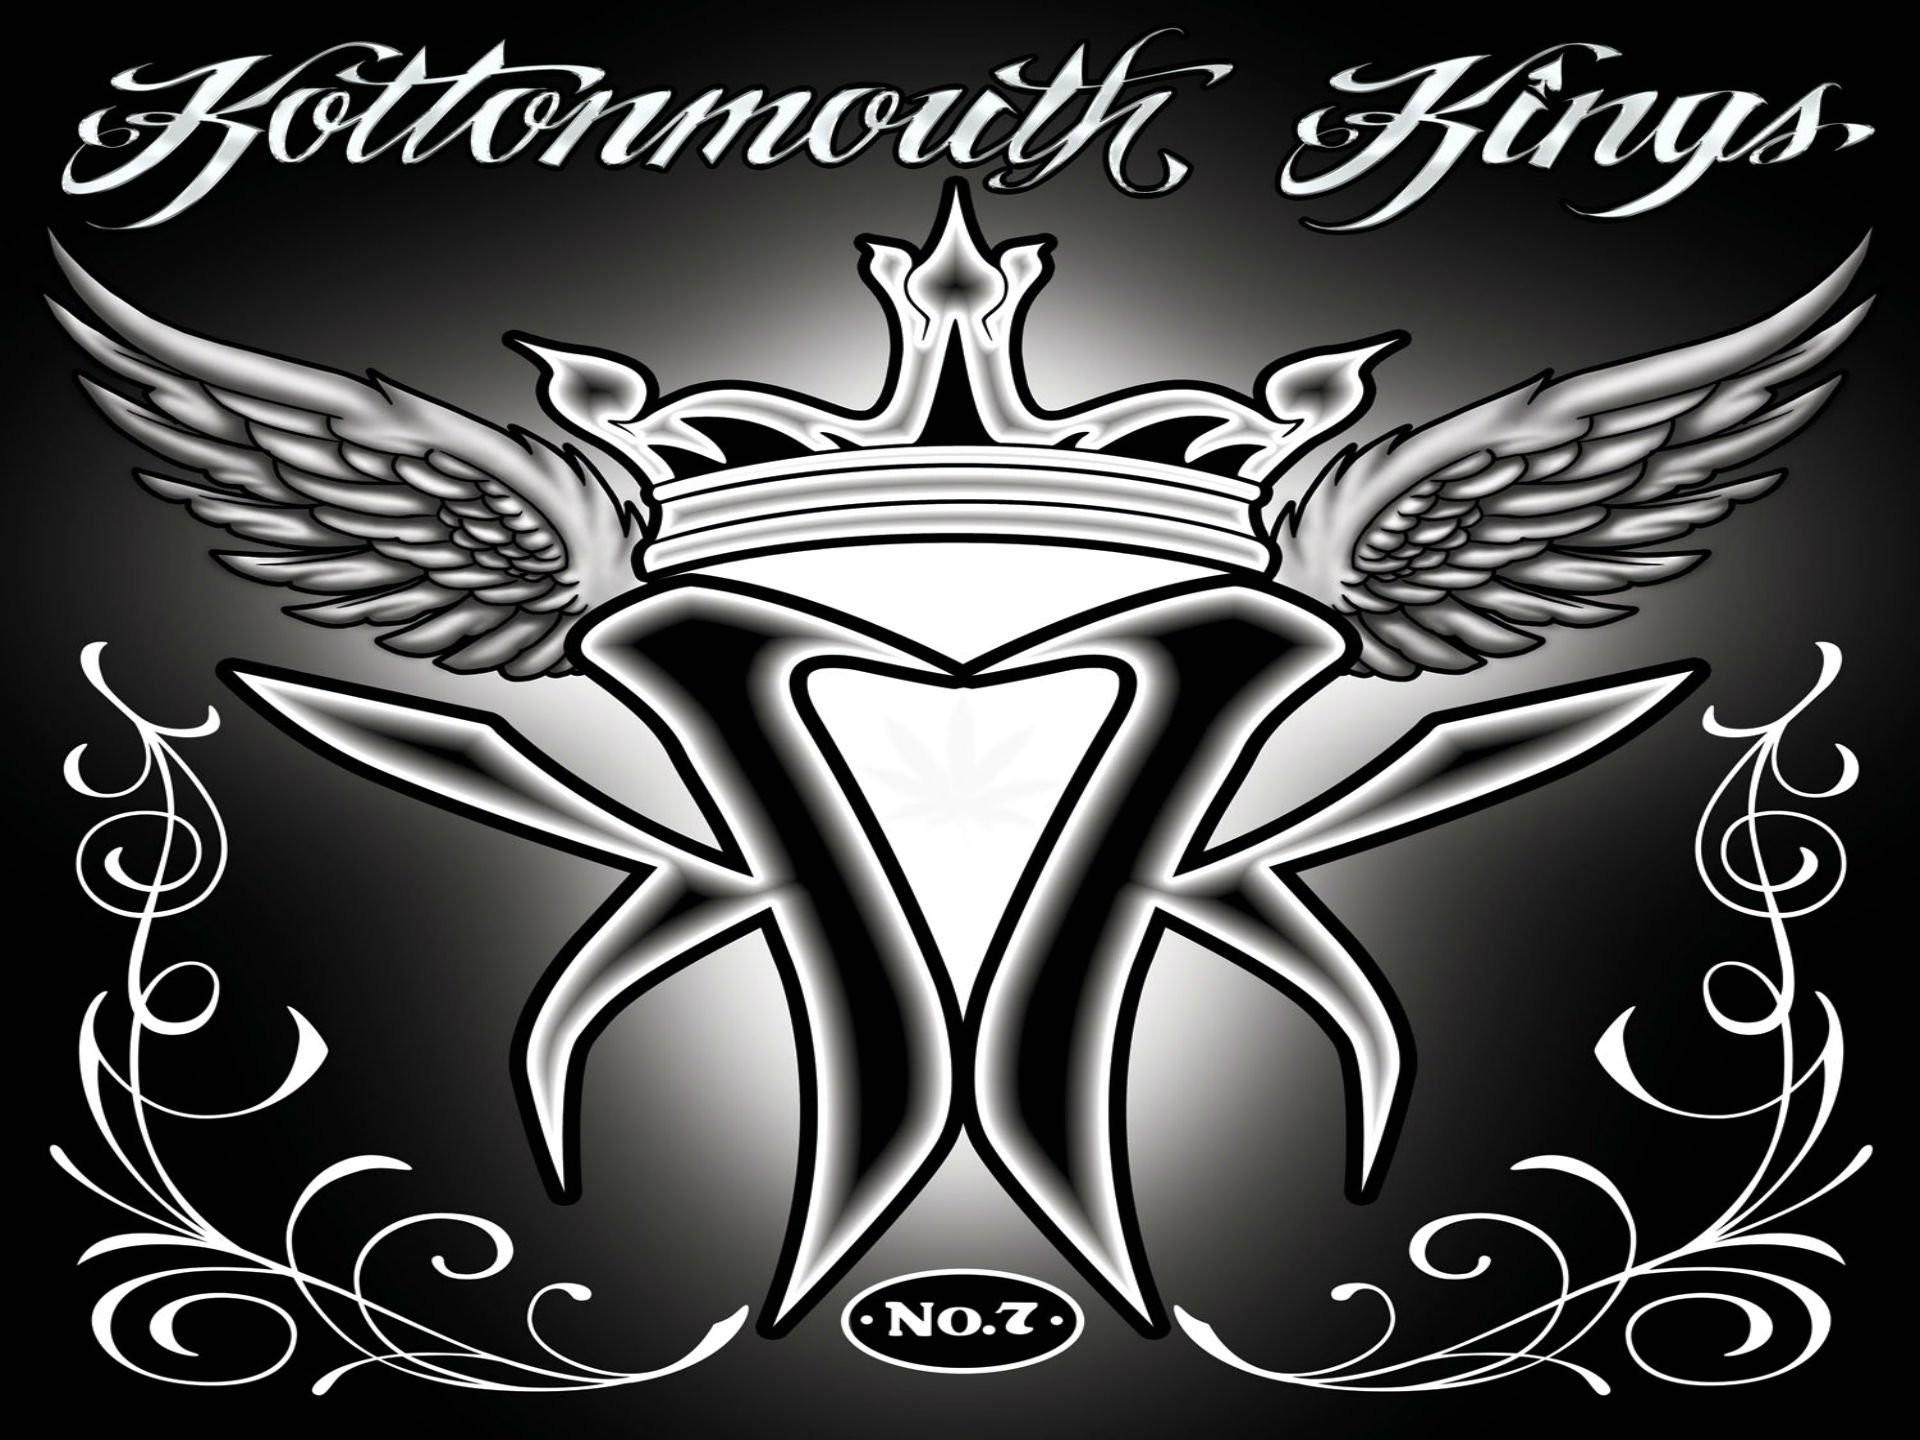 KOTTONMOUTH KINGS rap rapper hip hop marijuana drugs 420 wallpaper |  | 523686 | WallpaperUP